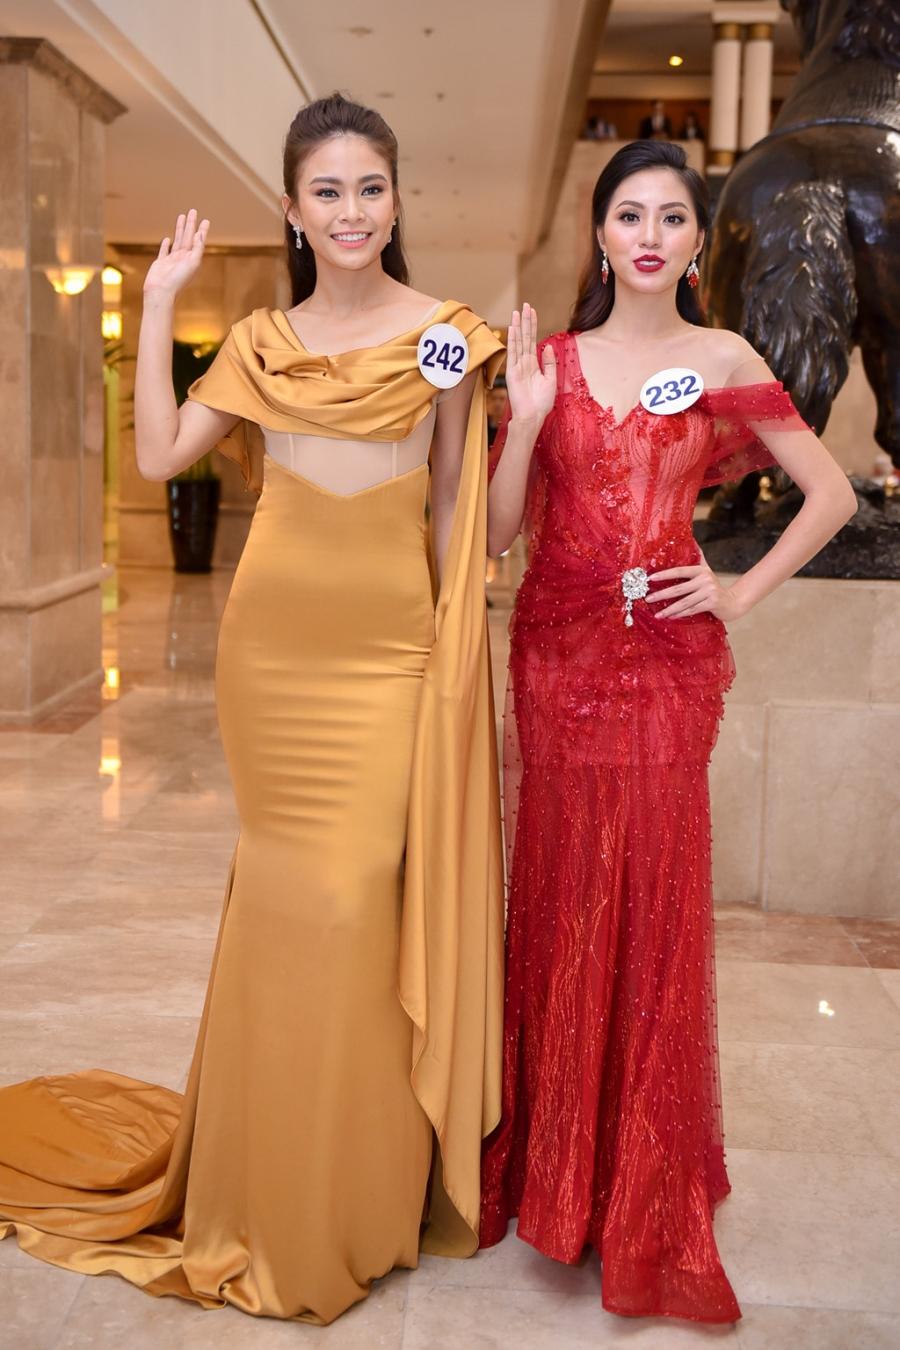 Pham Huong cui nguoi chinh vay cho Mau Thuy giua on ao chen ep hinh anh 5